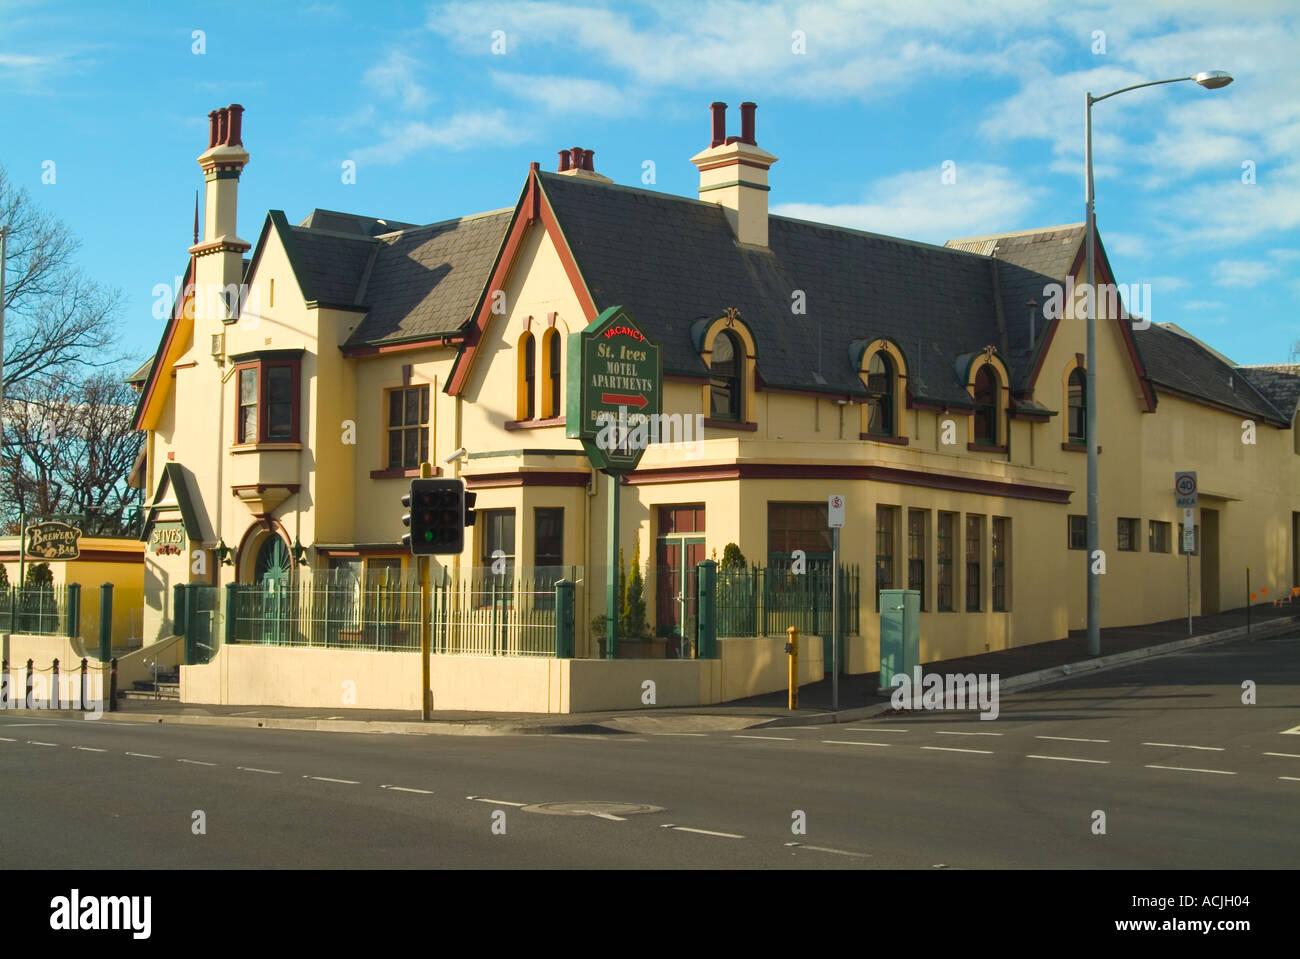 st ives hotel hobart tasmania australia stock photo. Black Bedroom Furniture Sets. Home Design Ideas